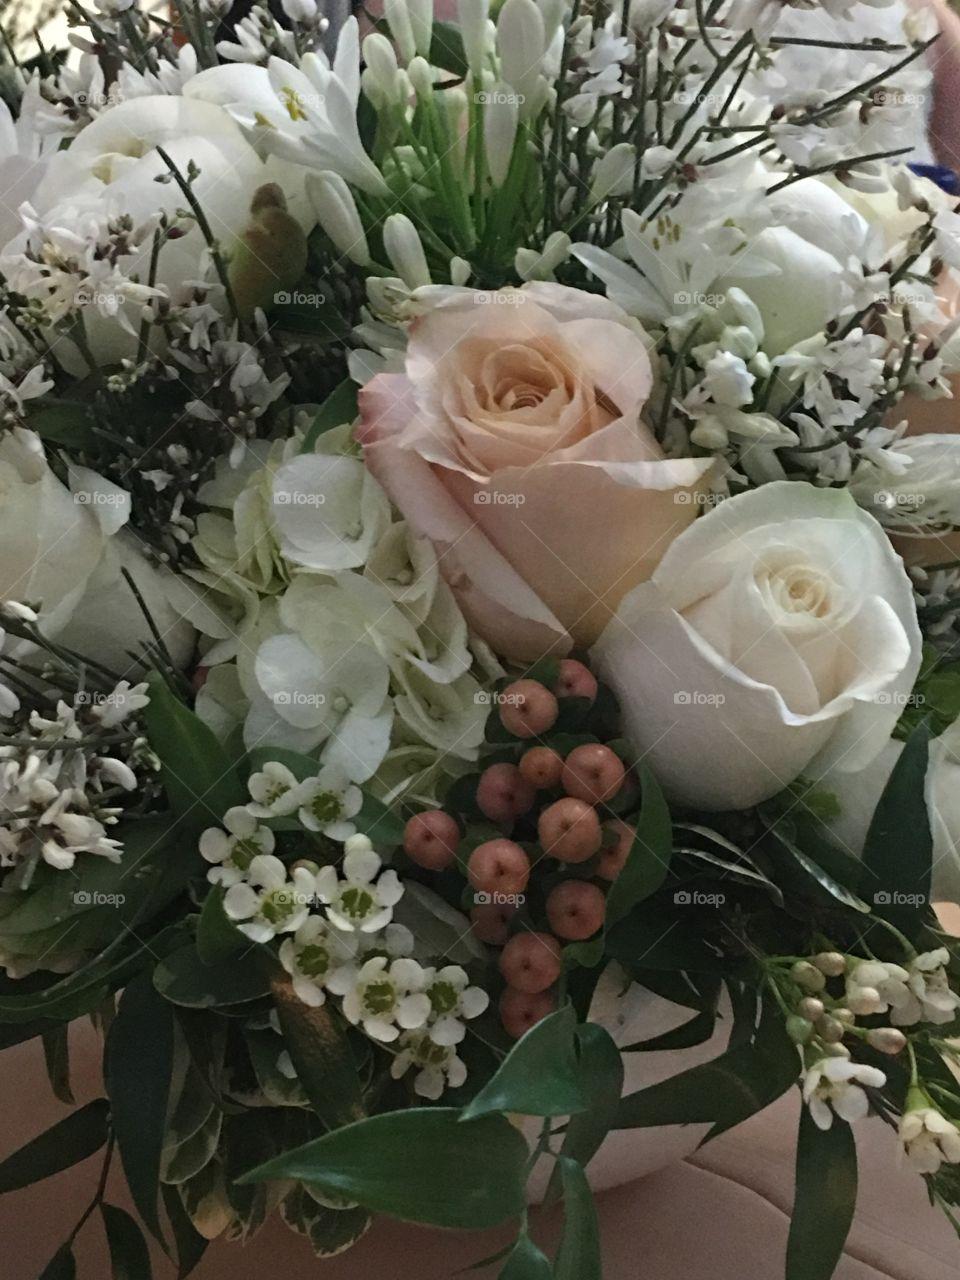 Wholefoods bouquet